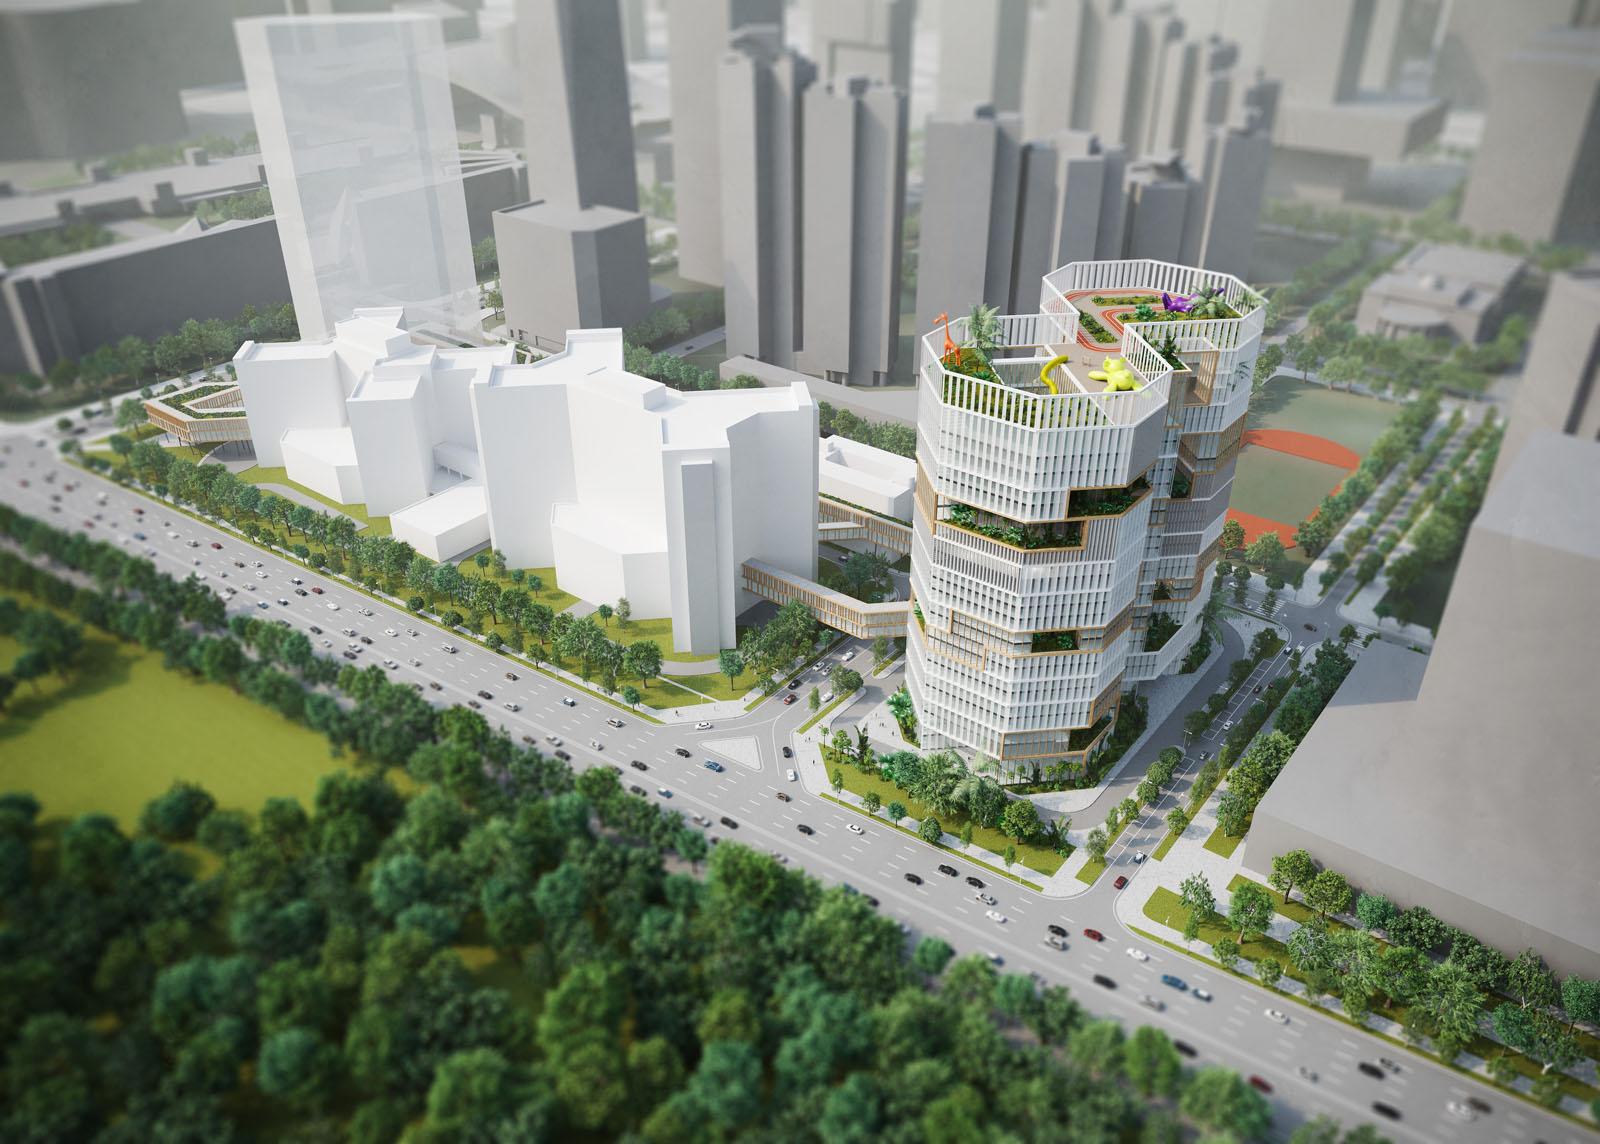 Shenzhen Children's Hospital